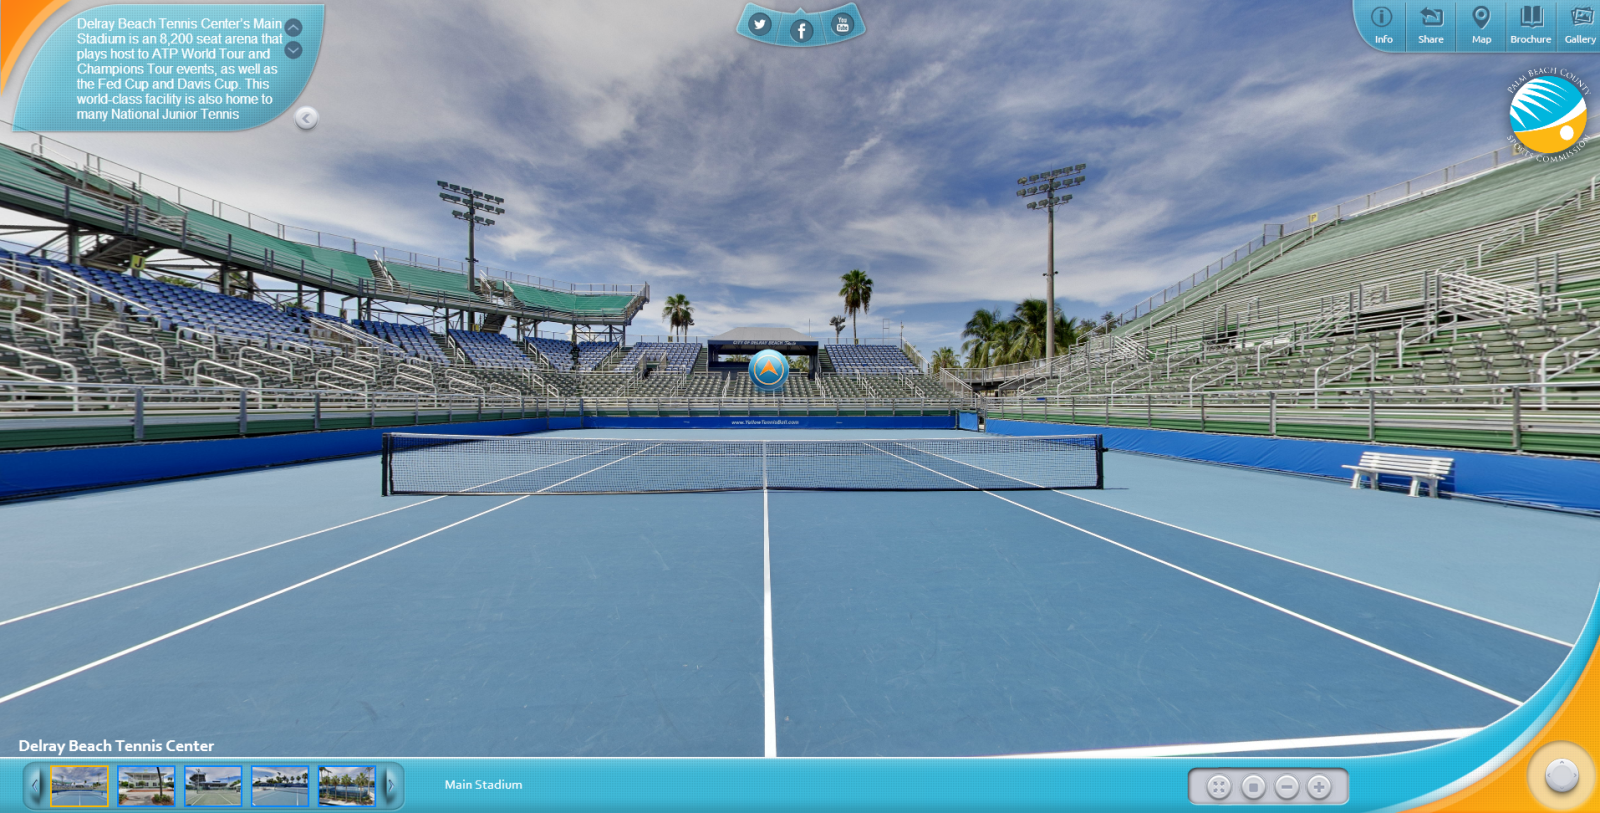 Tennis tournament palm beach gardens fasci garden - Palm beach gardens tennis center ...